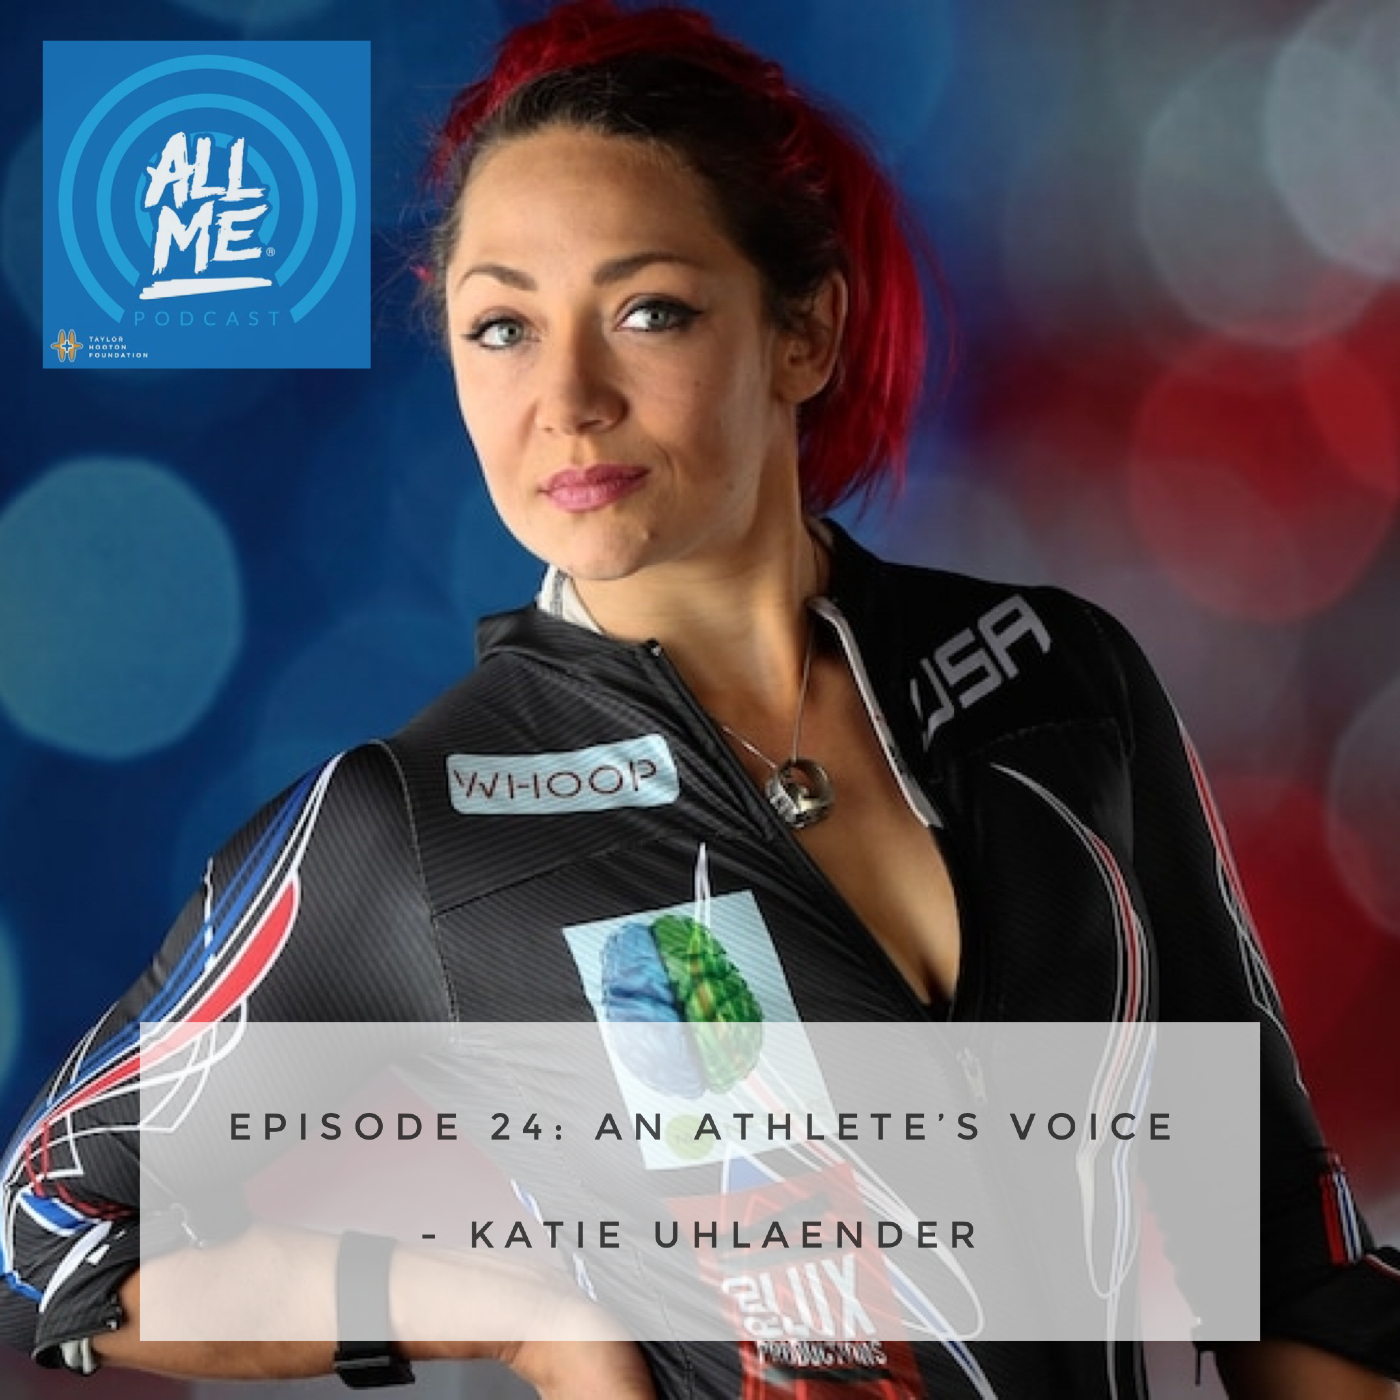 Episode 24: An Athlete's Voice – Katie Uhlaender